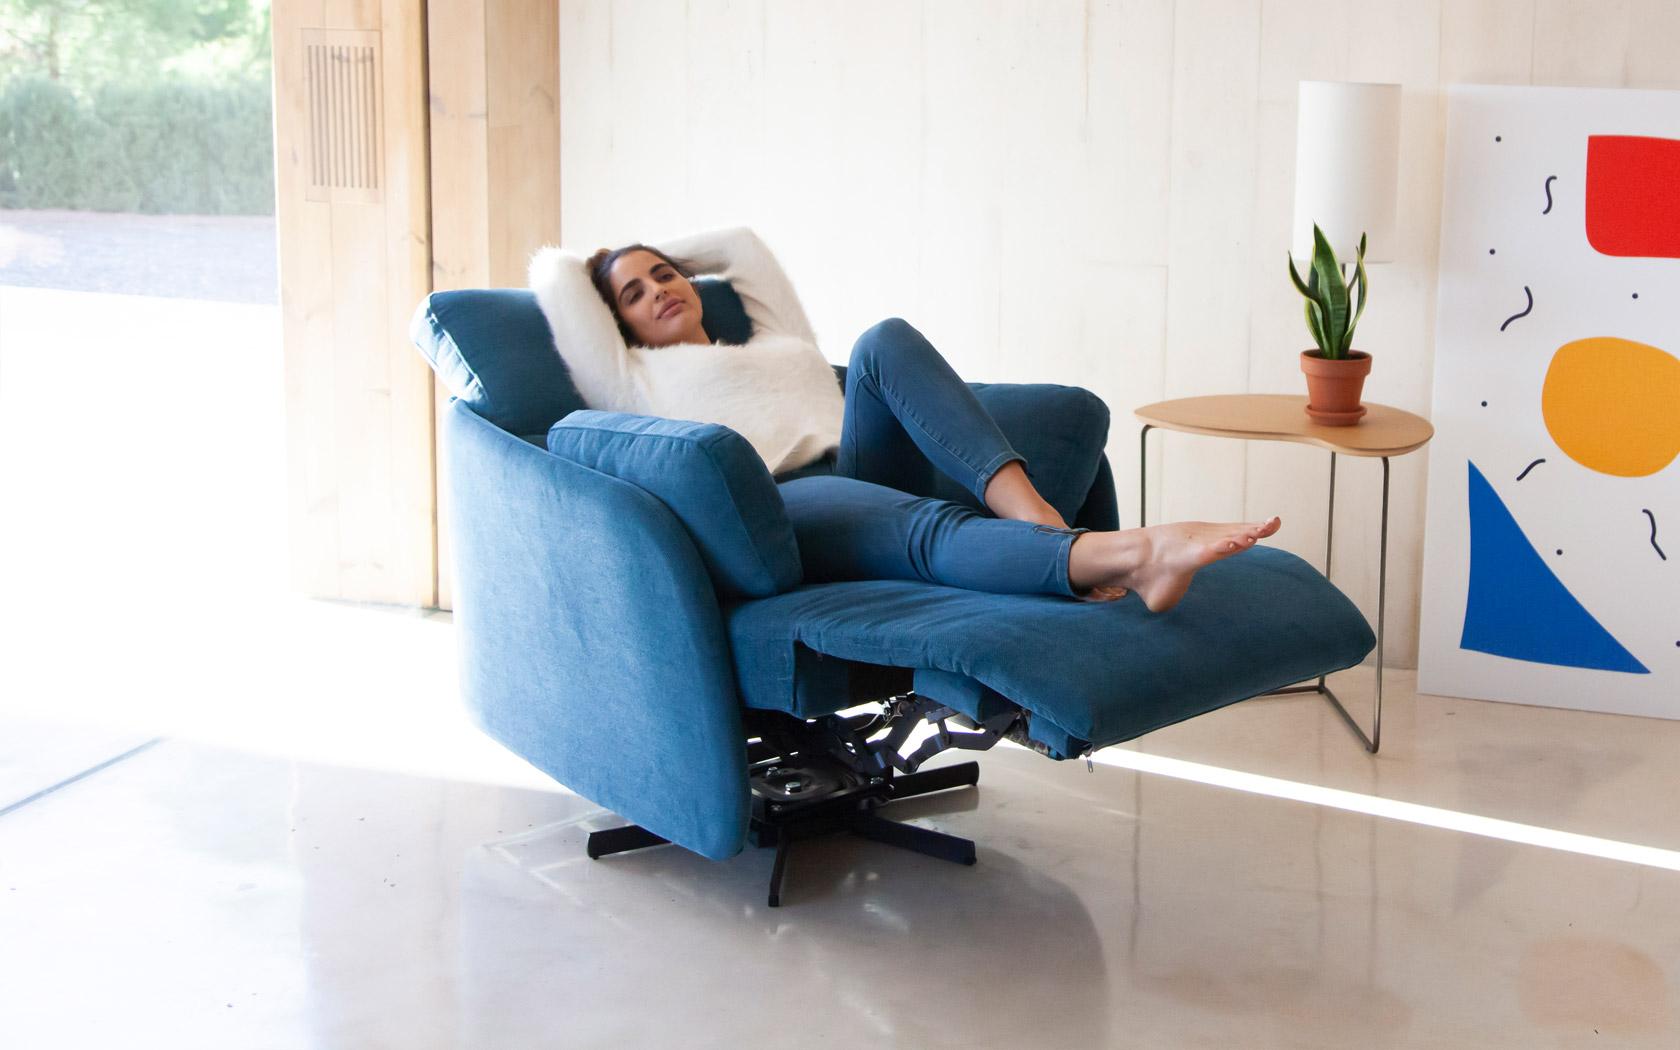 Adan sillon relax 2021 01